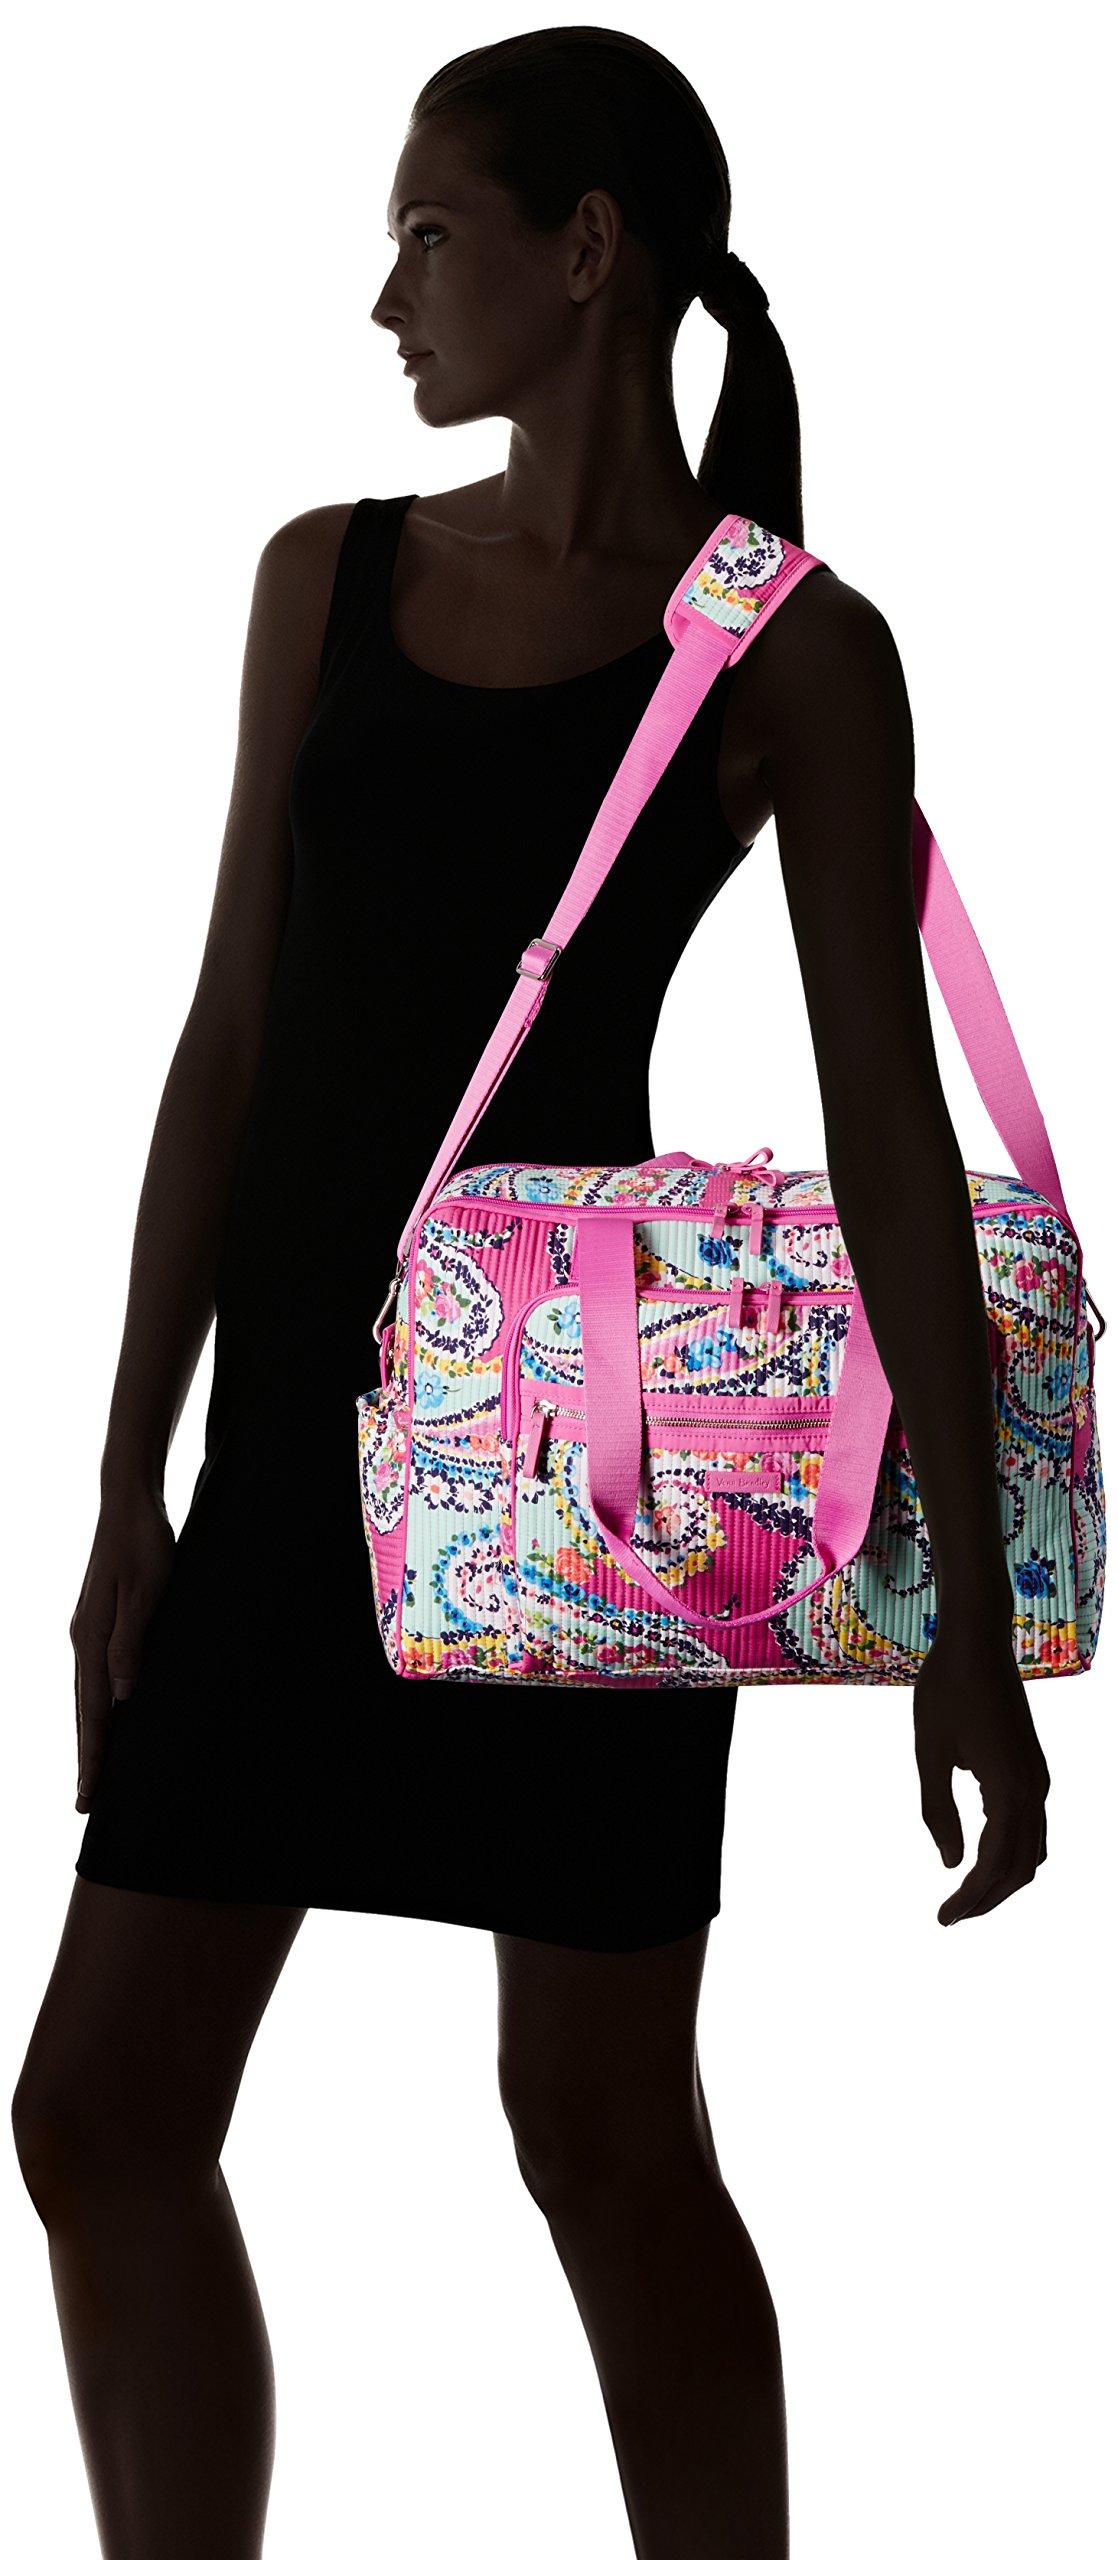 Vera Bradley Iconic Deluxe Weekender Travel Bag, Signature Cotton by Vera Bradley (Image #6)